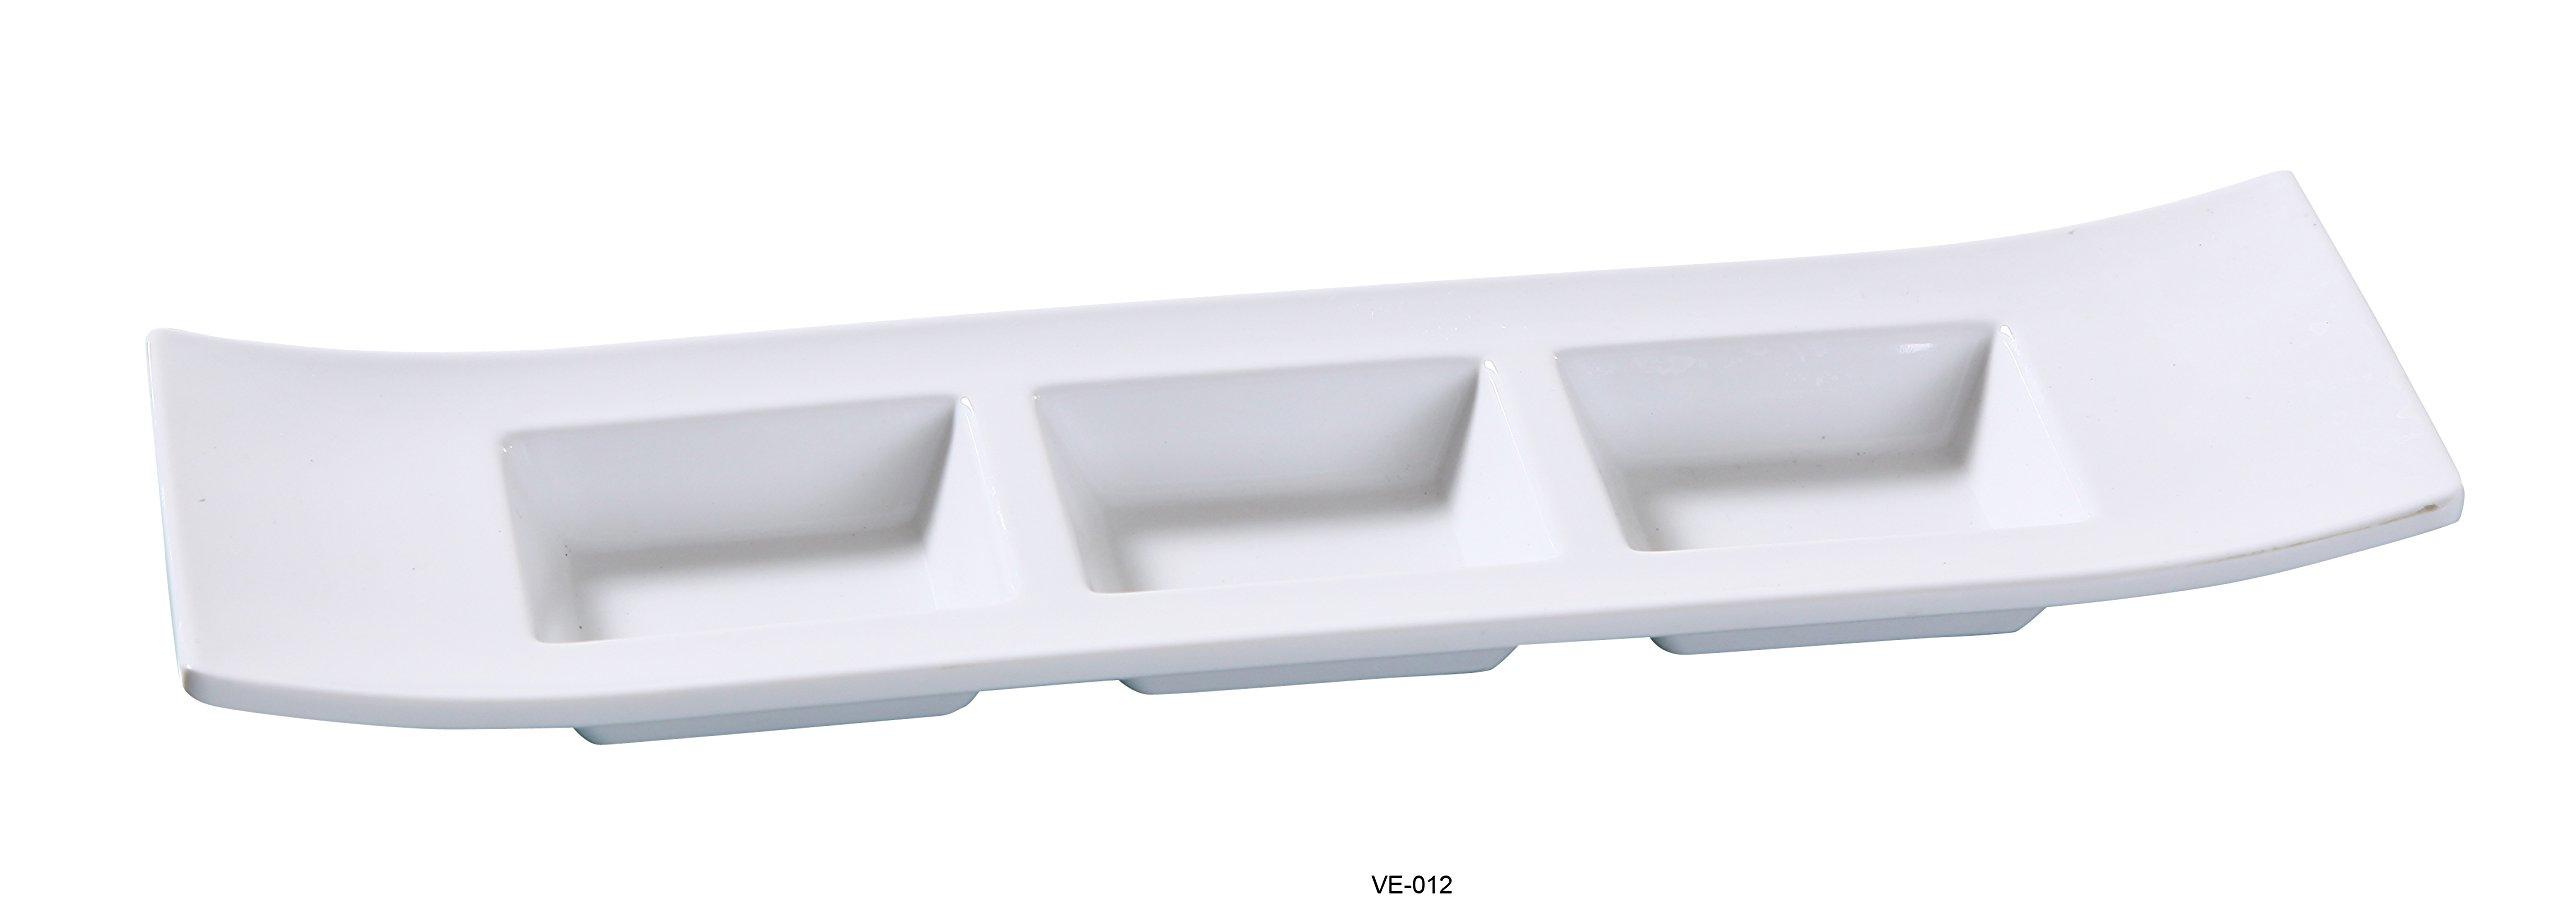 Yanco Venice Collection Melamine Italian Style Triple Divided Dish )11 1/2'' X 3 1/2'') 1.5 Oz Each BOX of 48